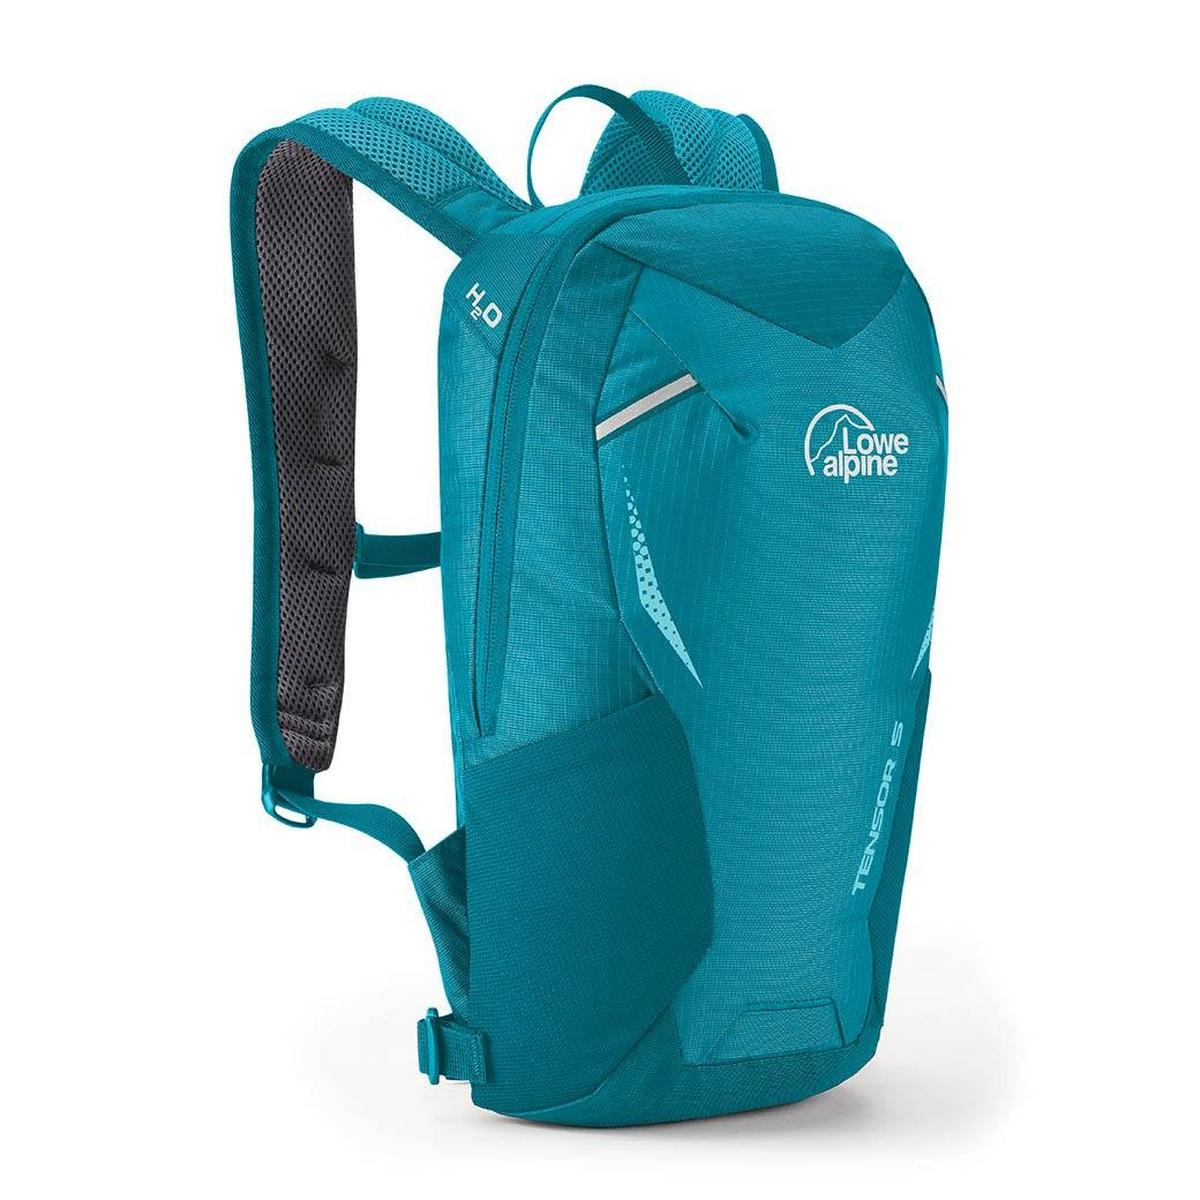 Lowe Alpine Tensor 5 Small Daypack